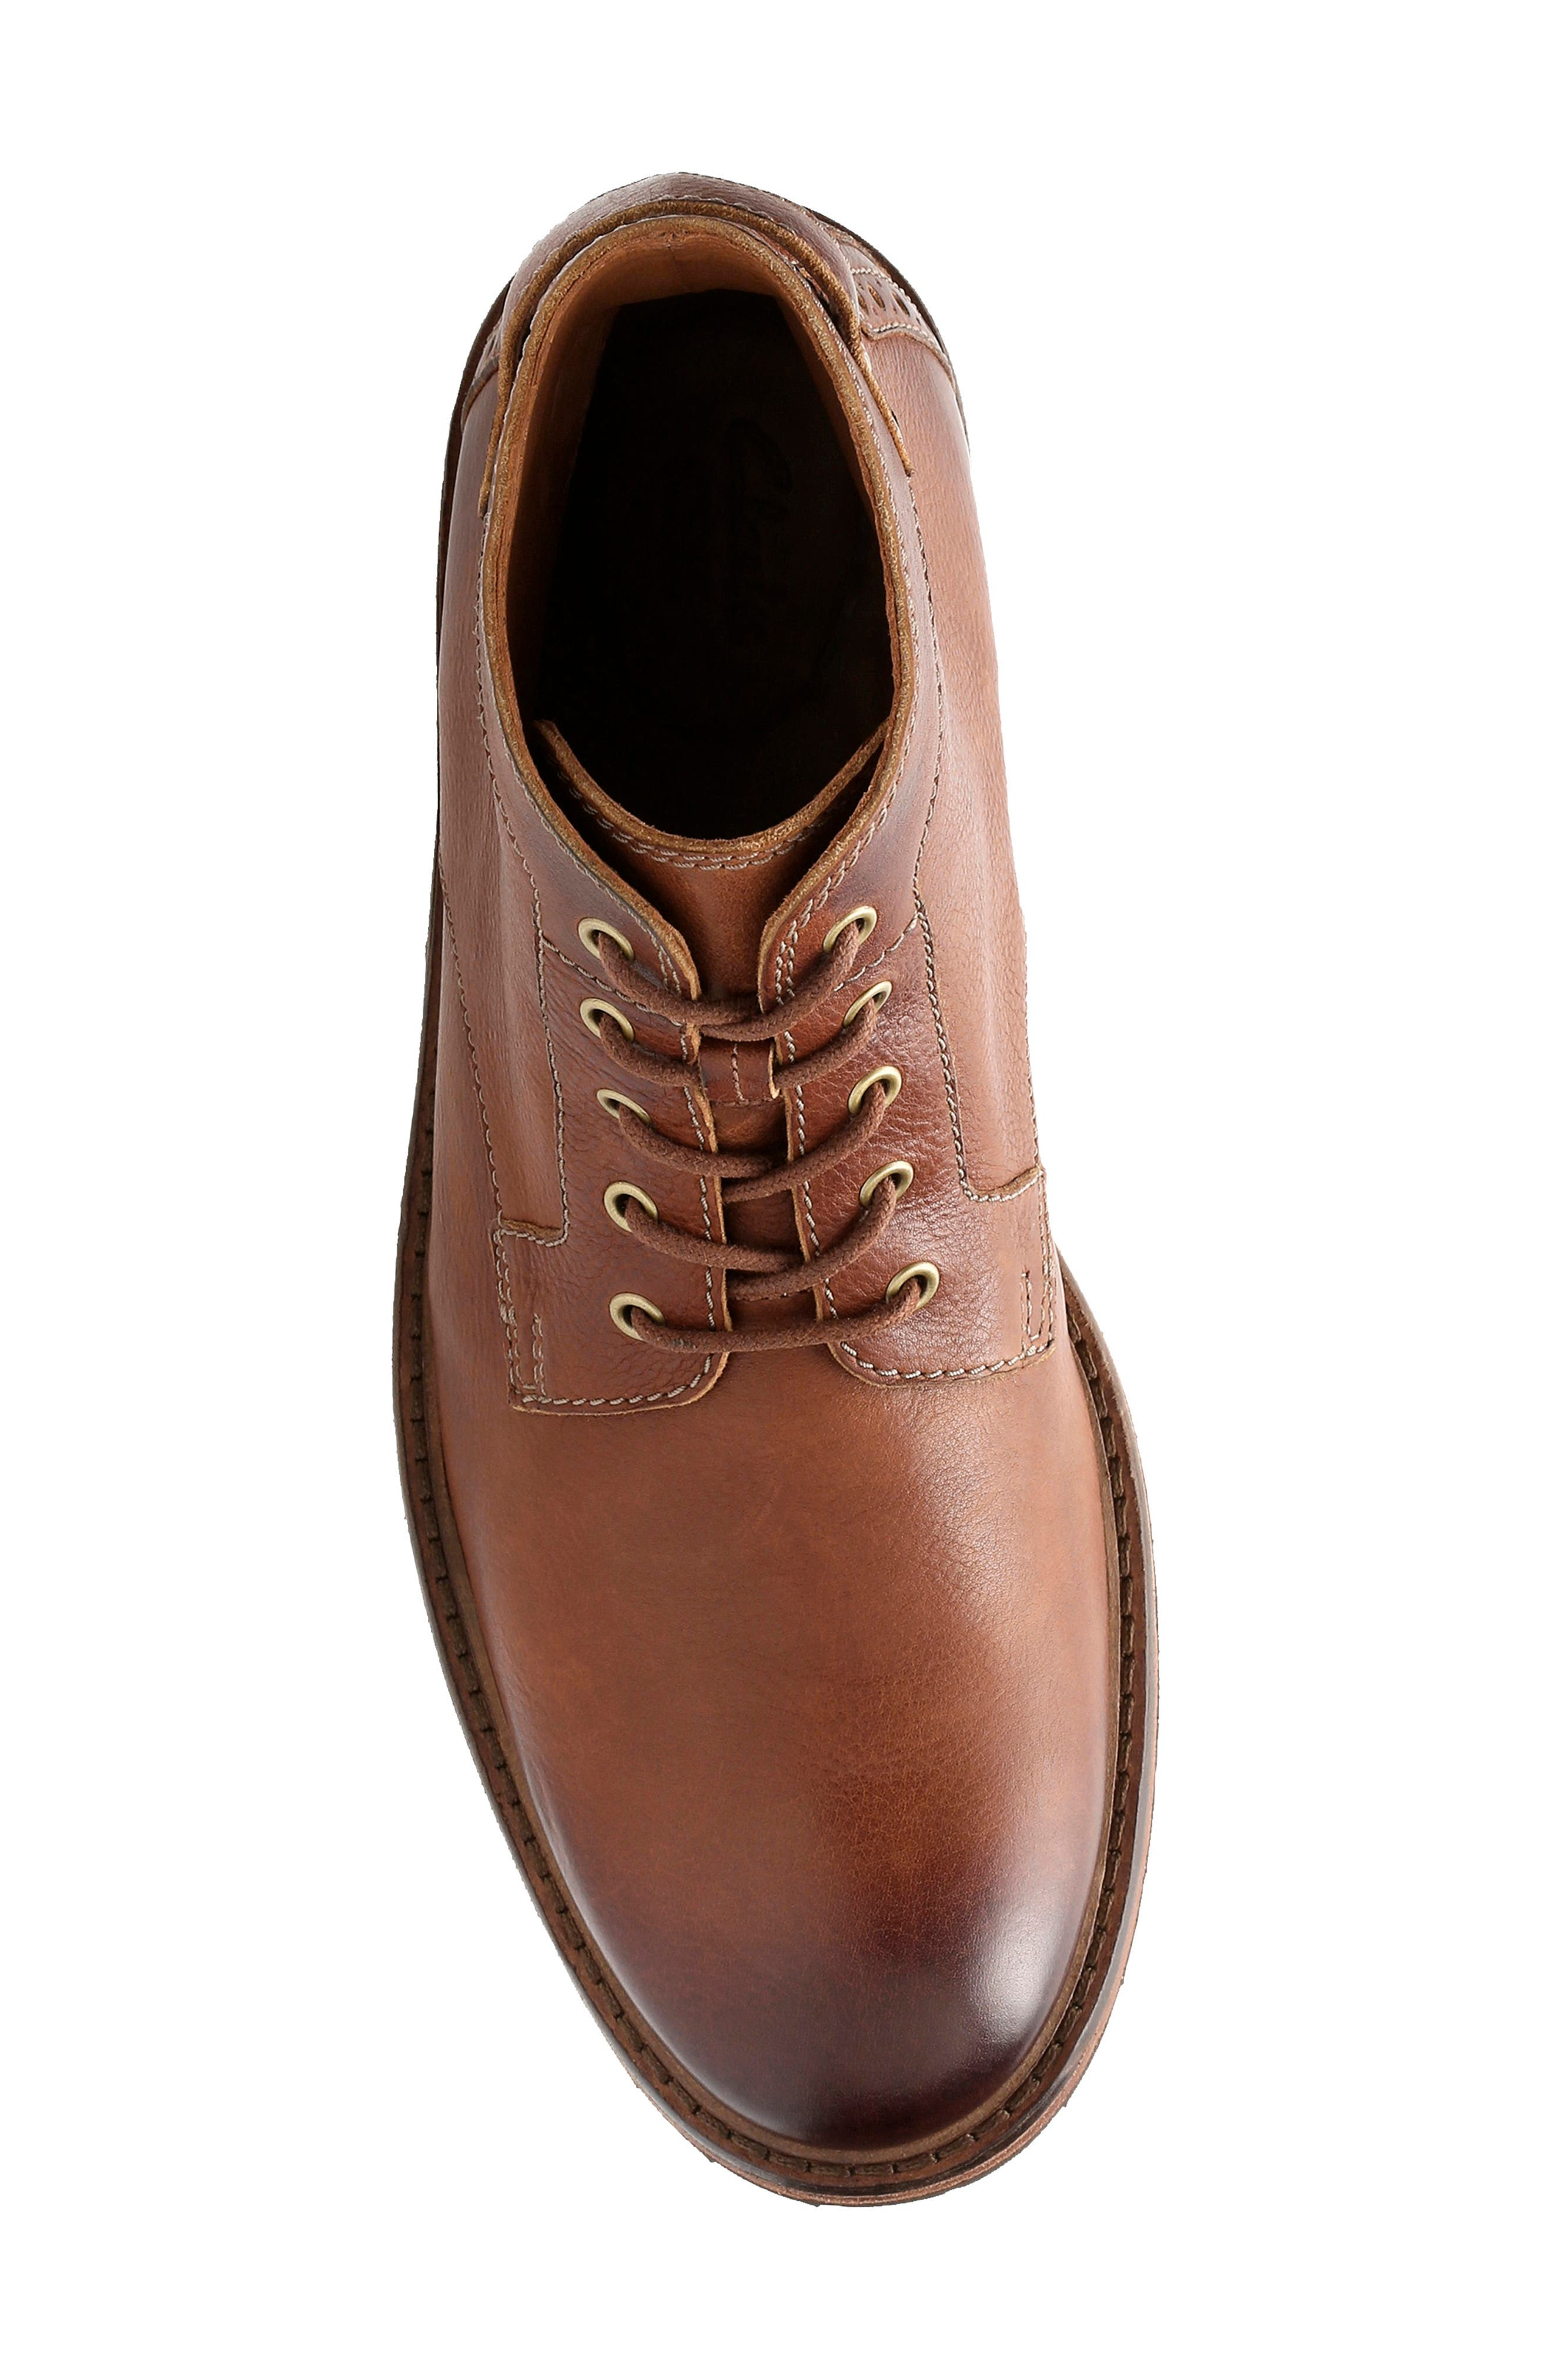 Clarkdale Bud Plain Toe Boot,                             Alternate thumbnail 3, color,                             DARK TAN LEATHER